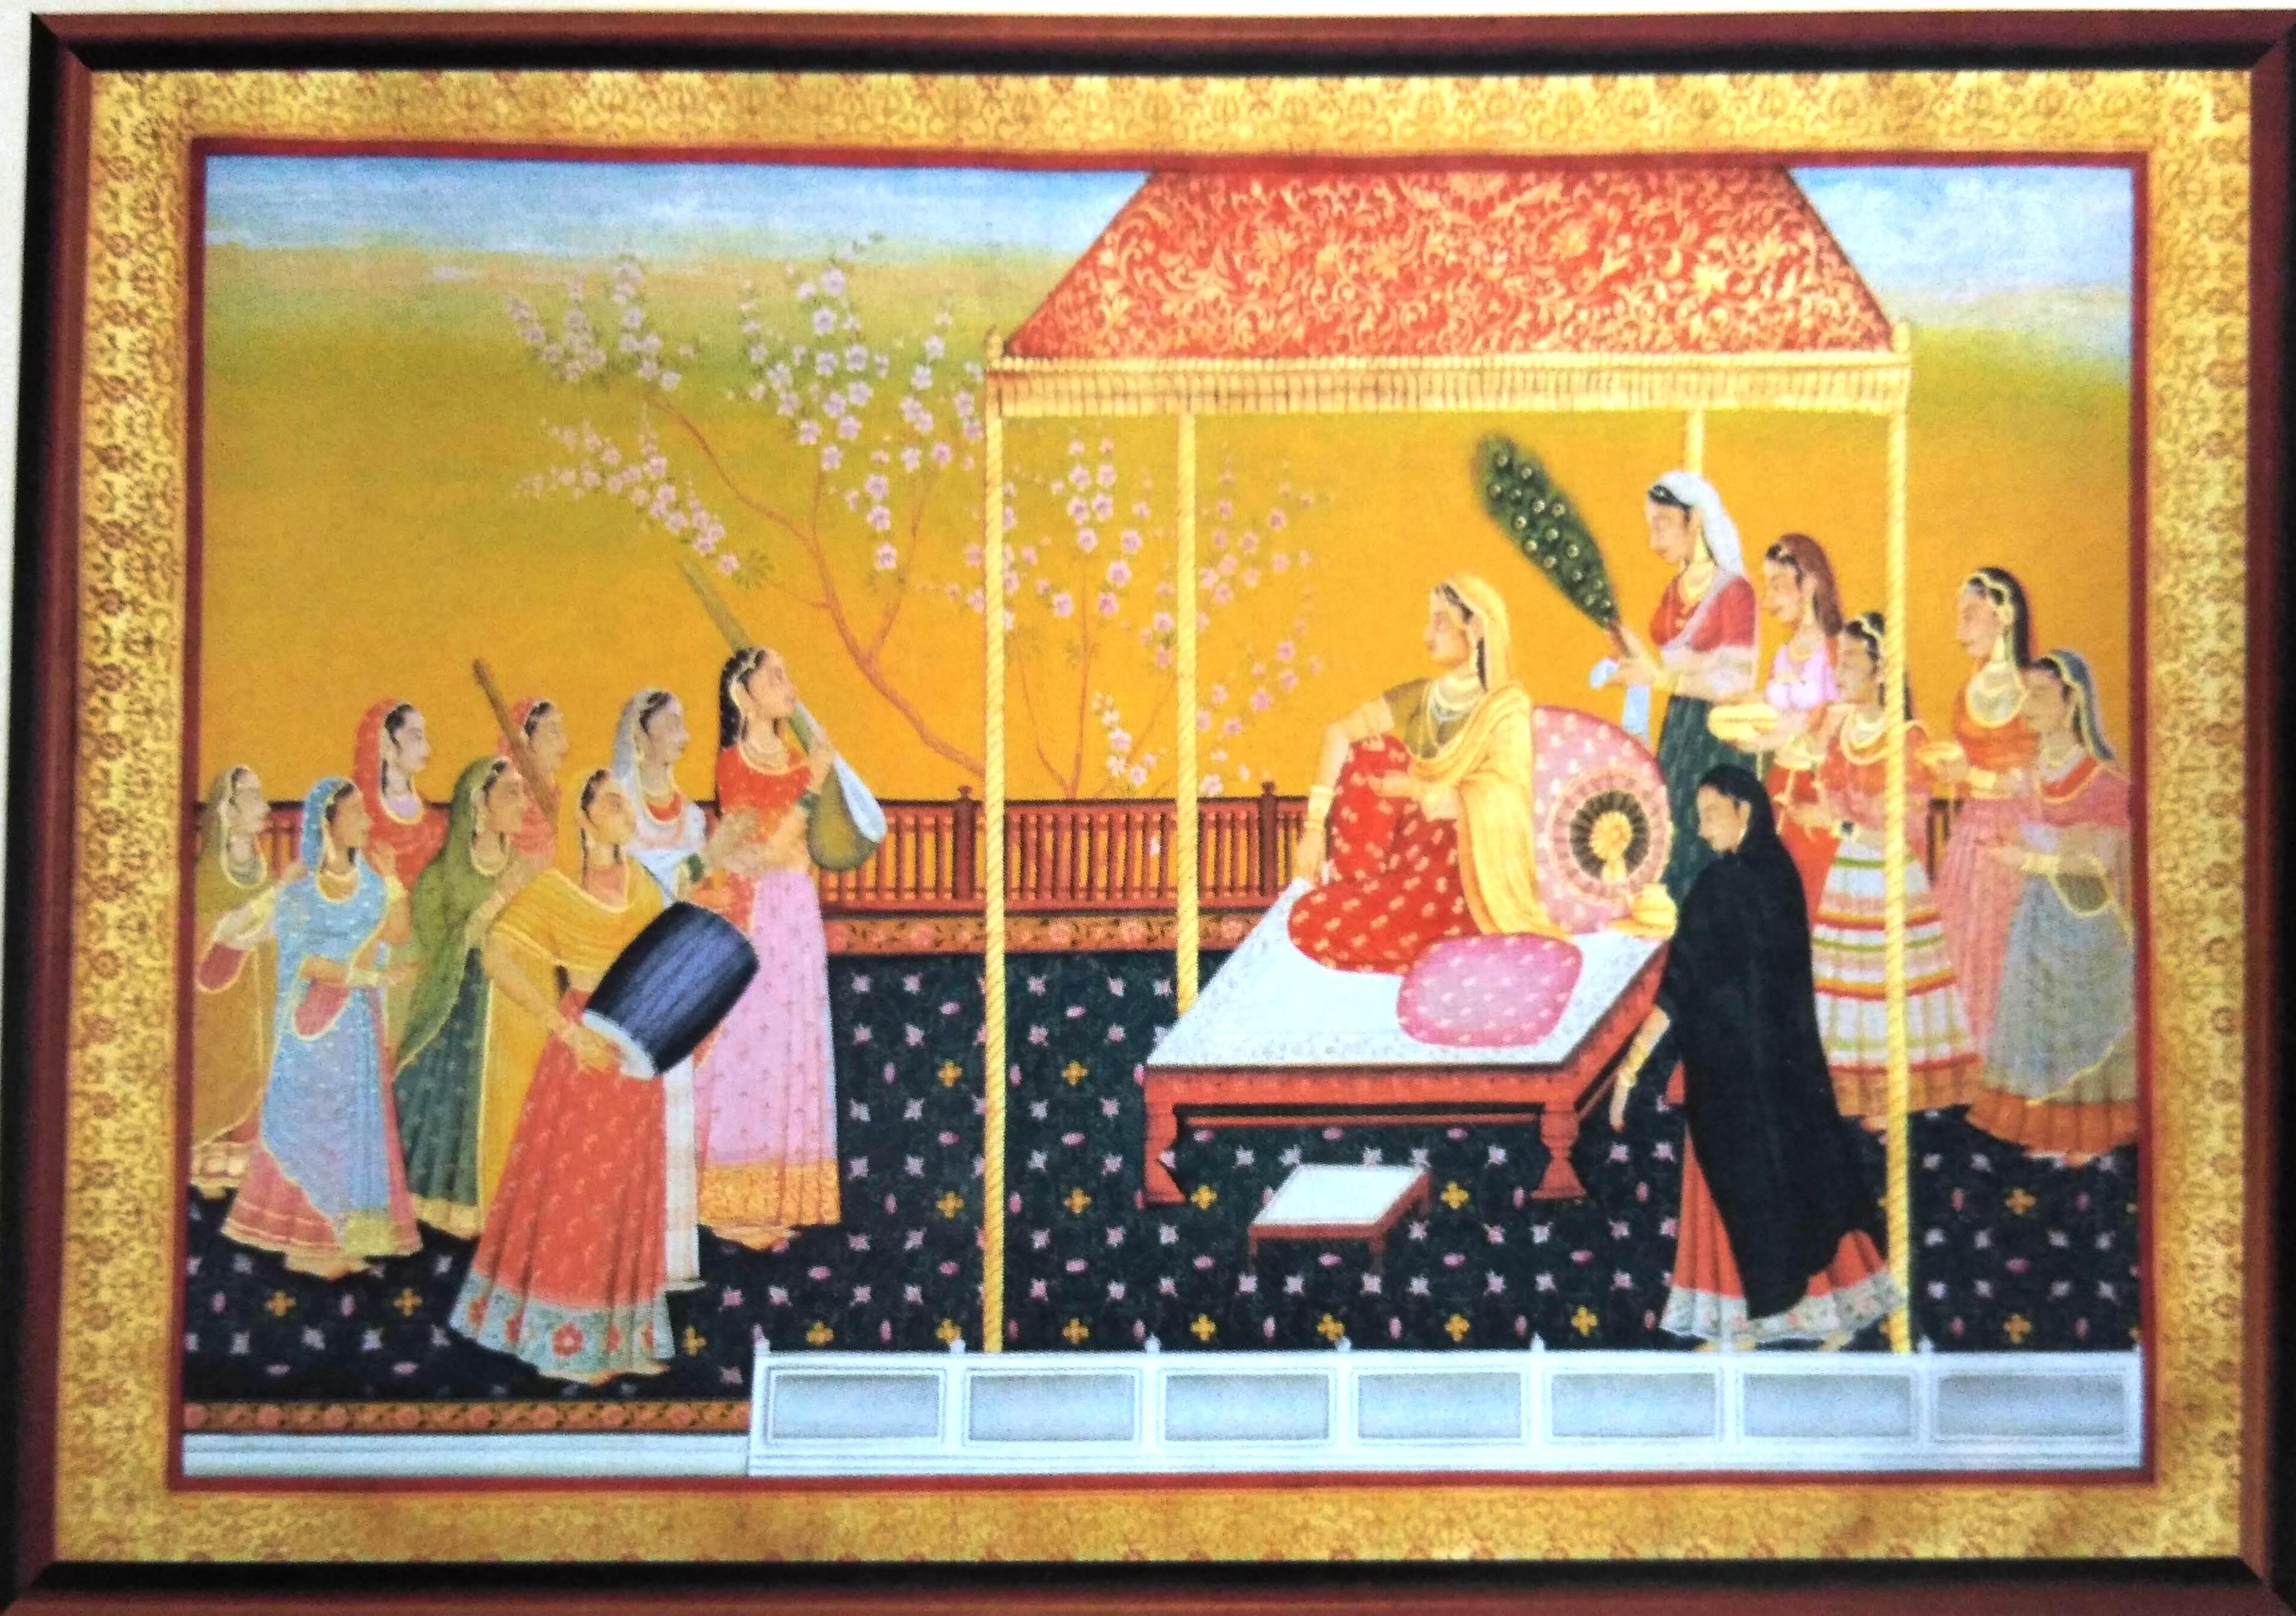 Chamba School Painting